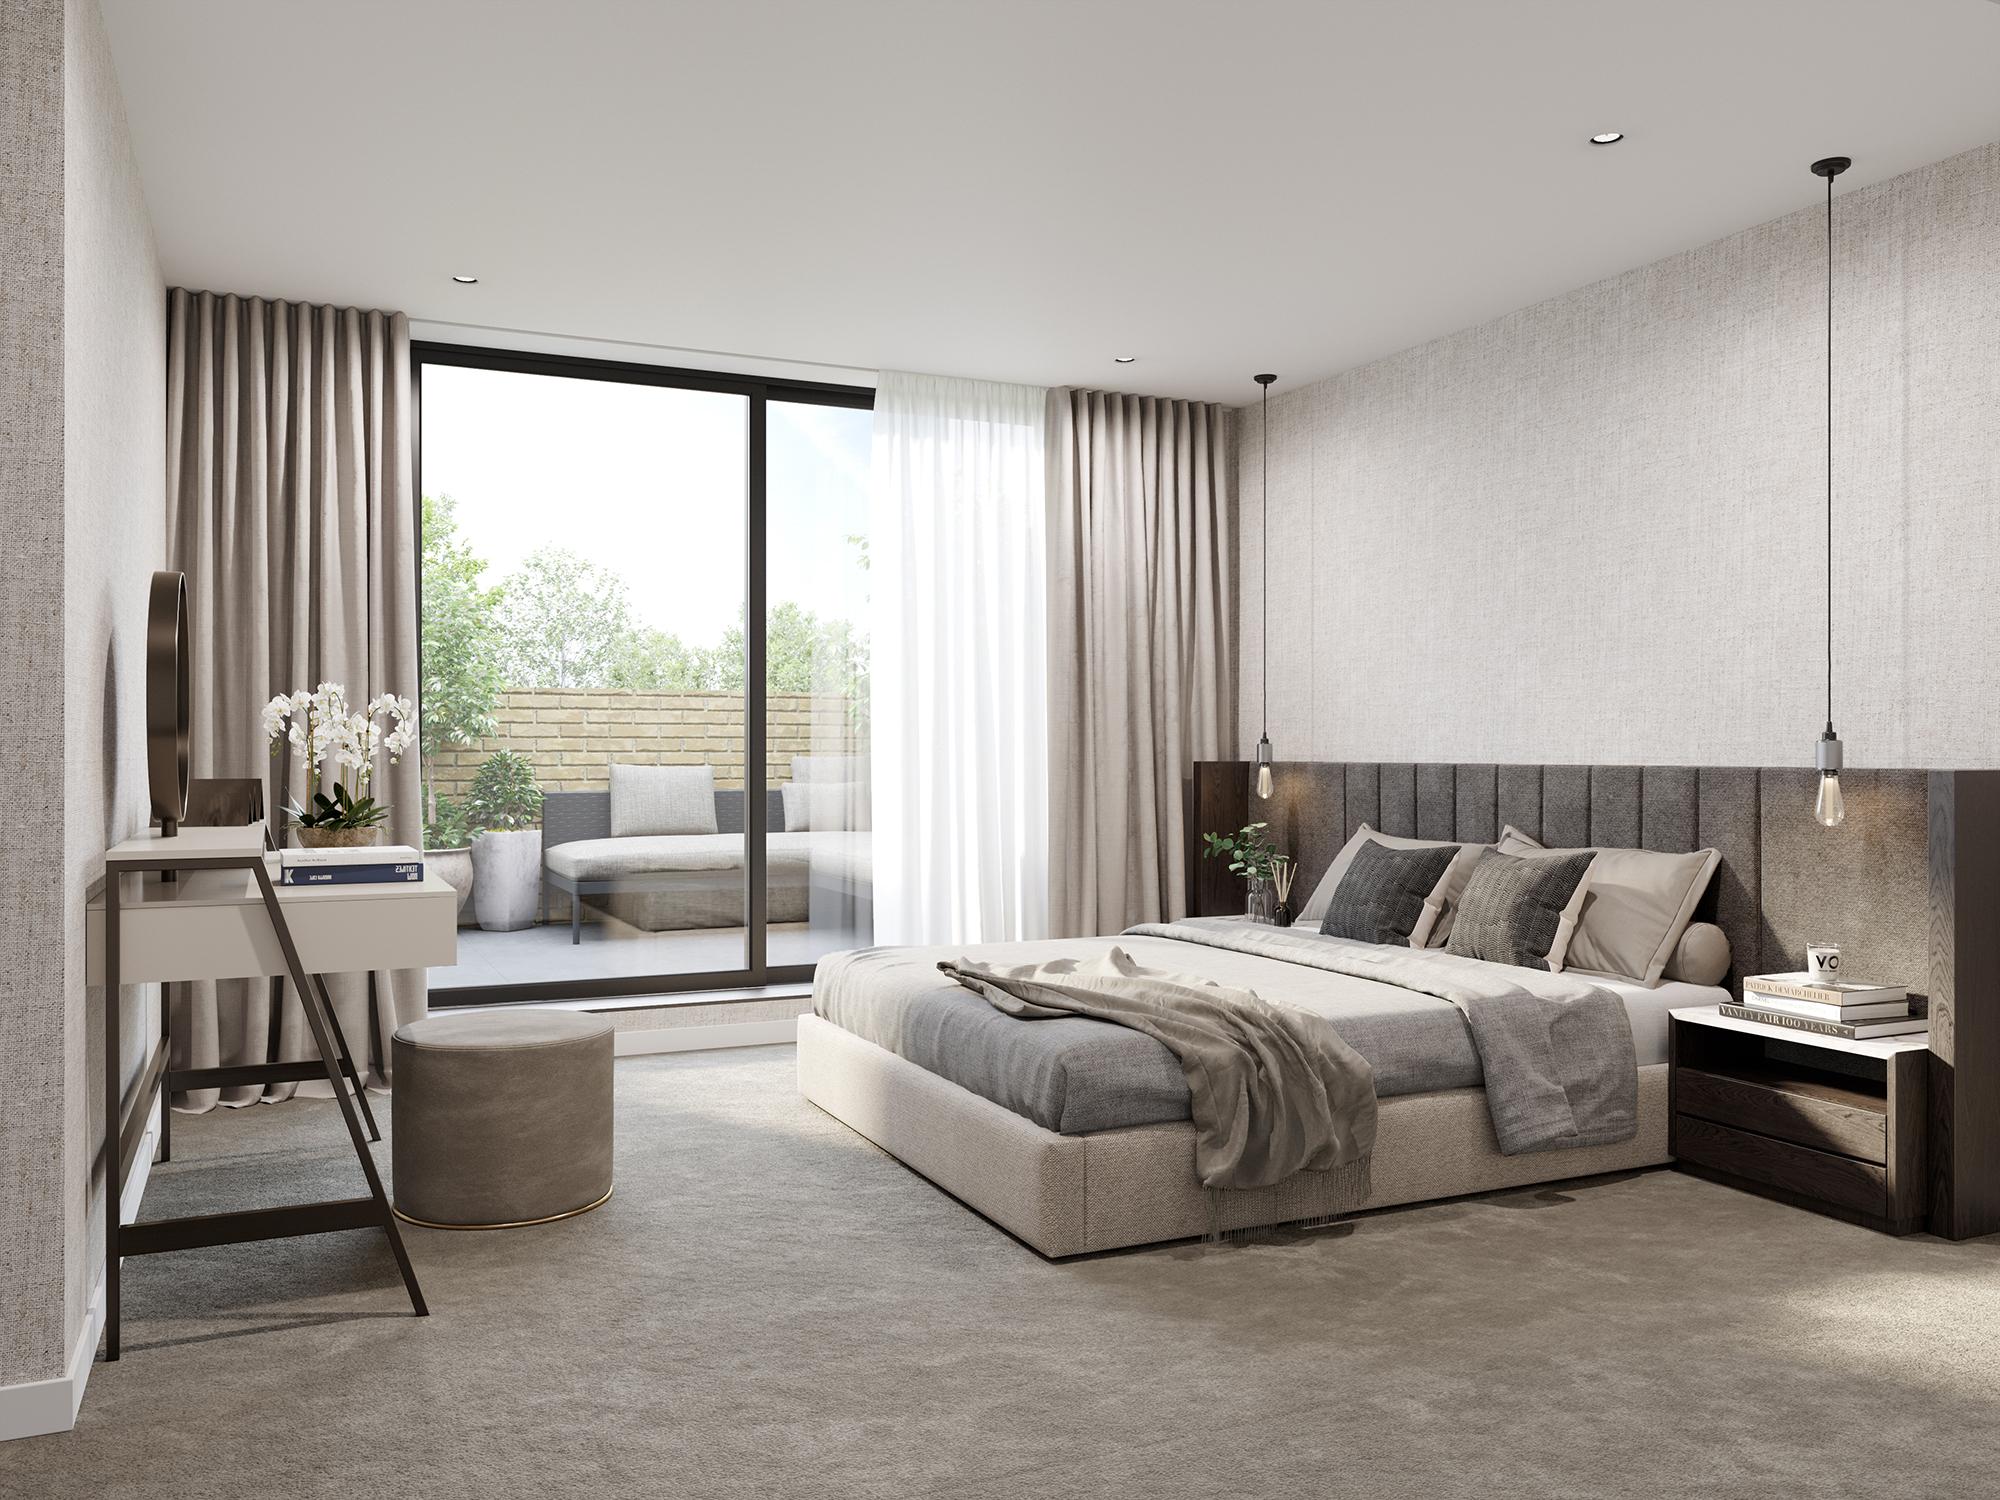 Bedroom_01_6 (1).jpg